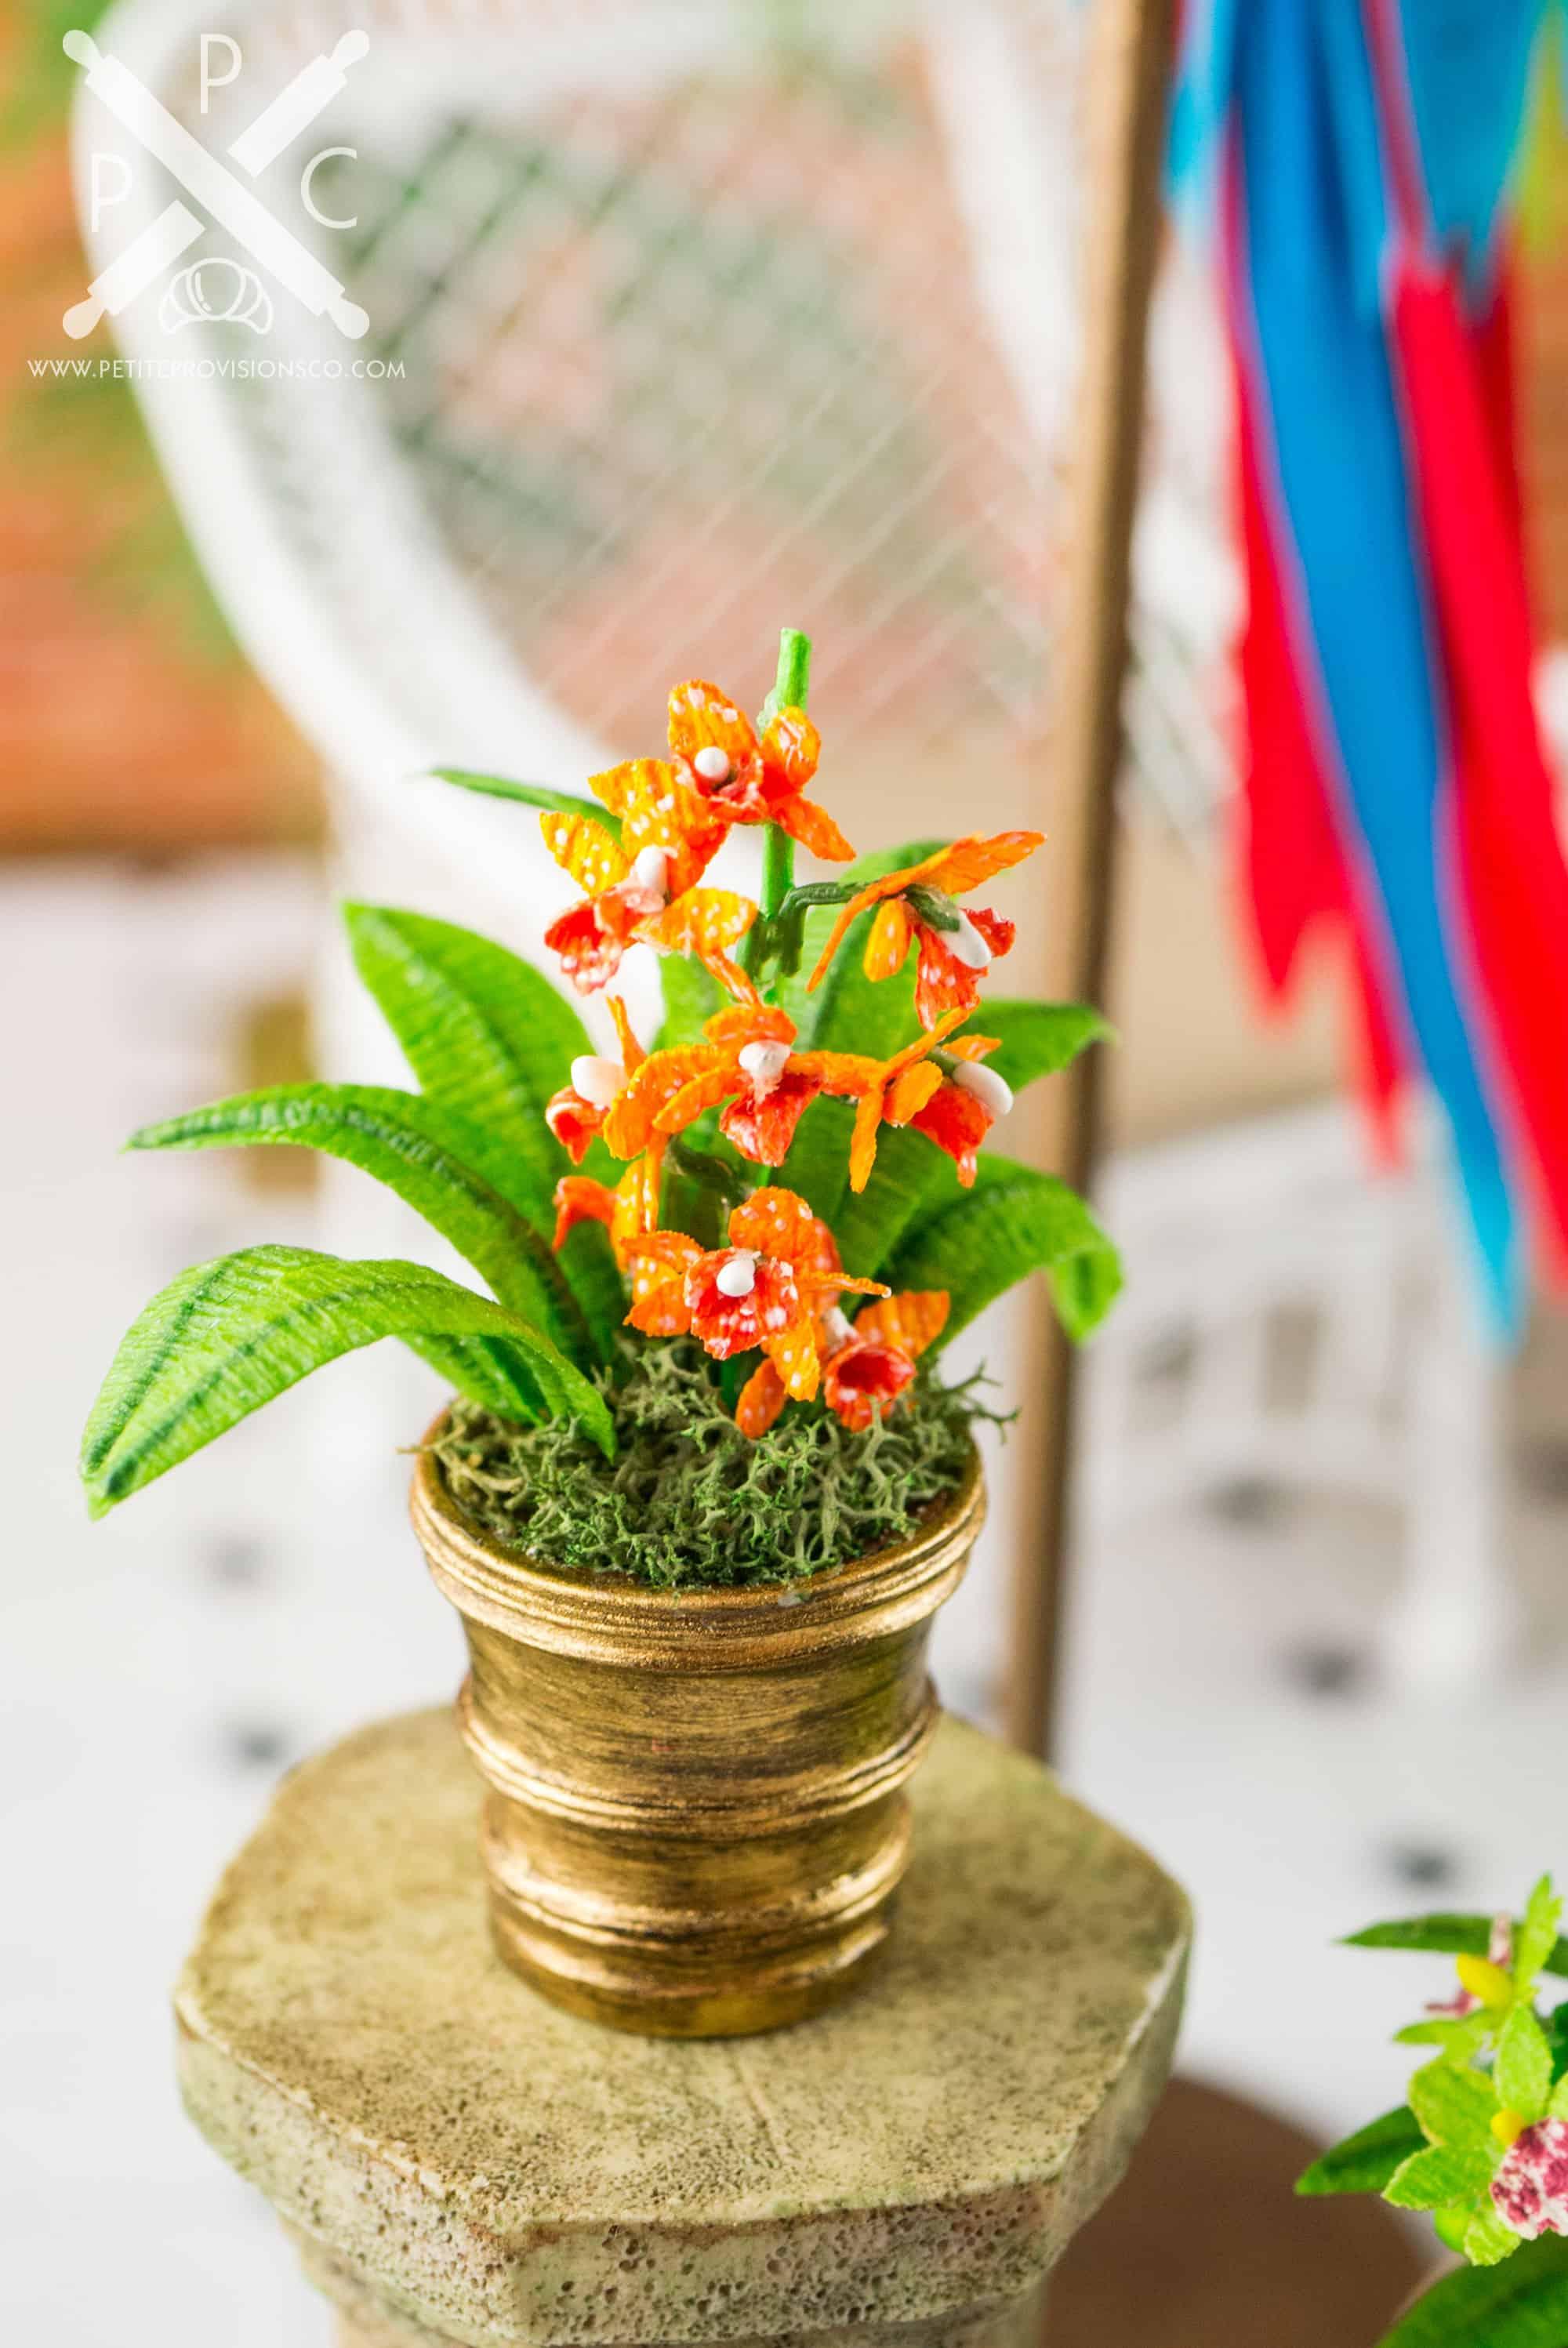 Dollhouse Miniature Conservatory by The Petite Provisions Co. - Cymbidium Orchid Arrangement